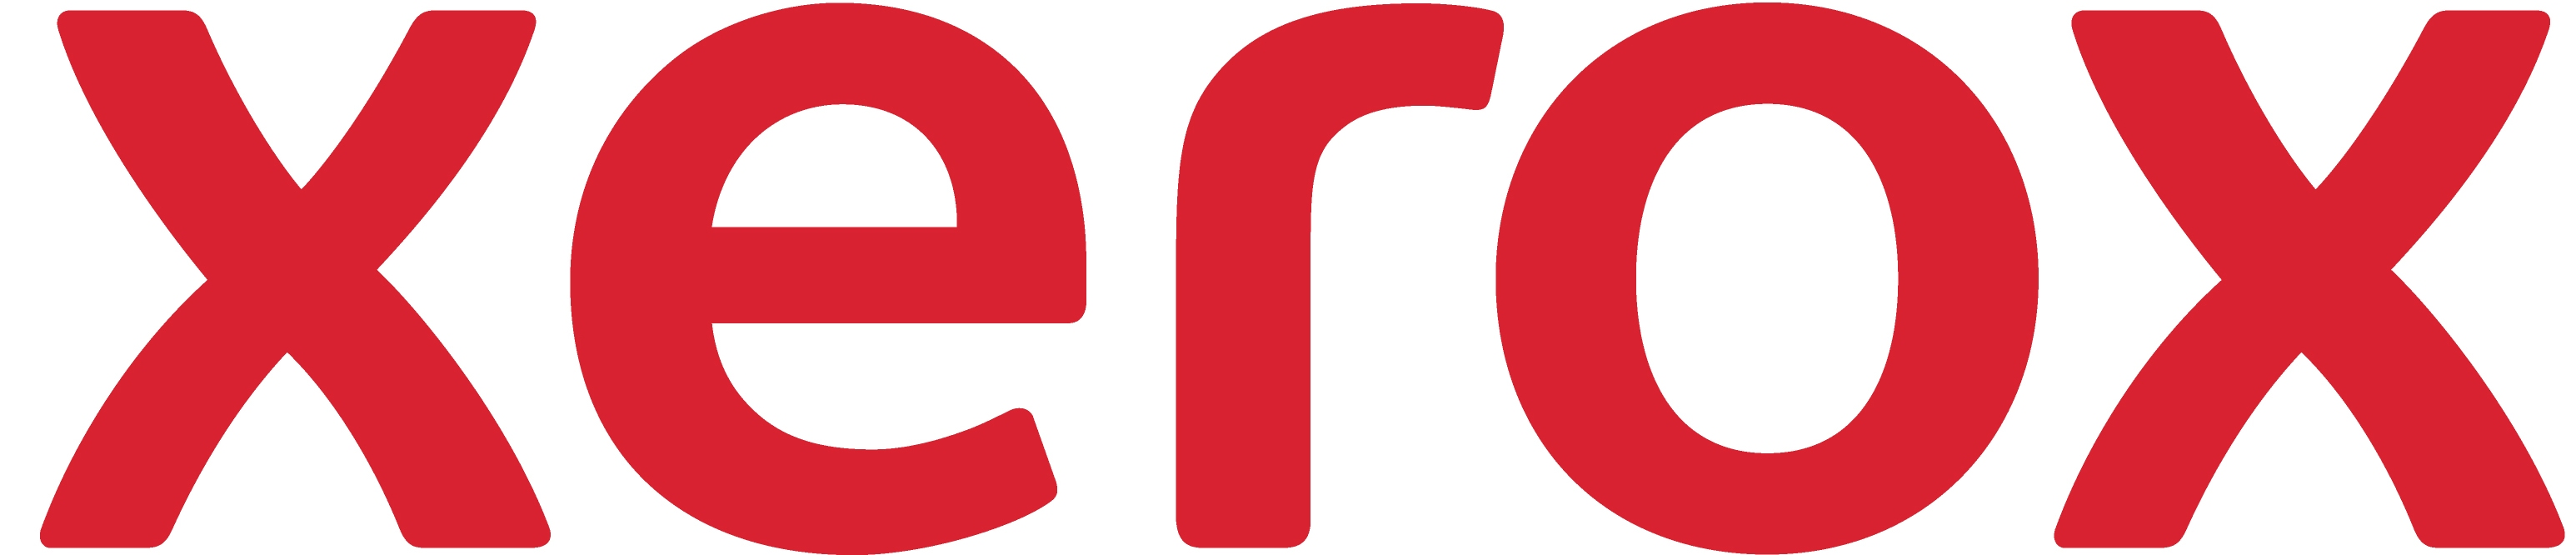 Xerox Premier Partners Forum